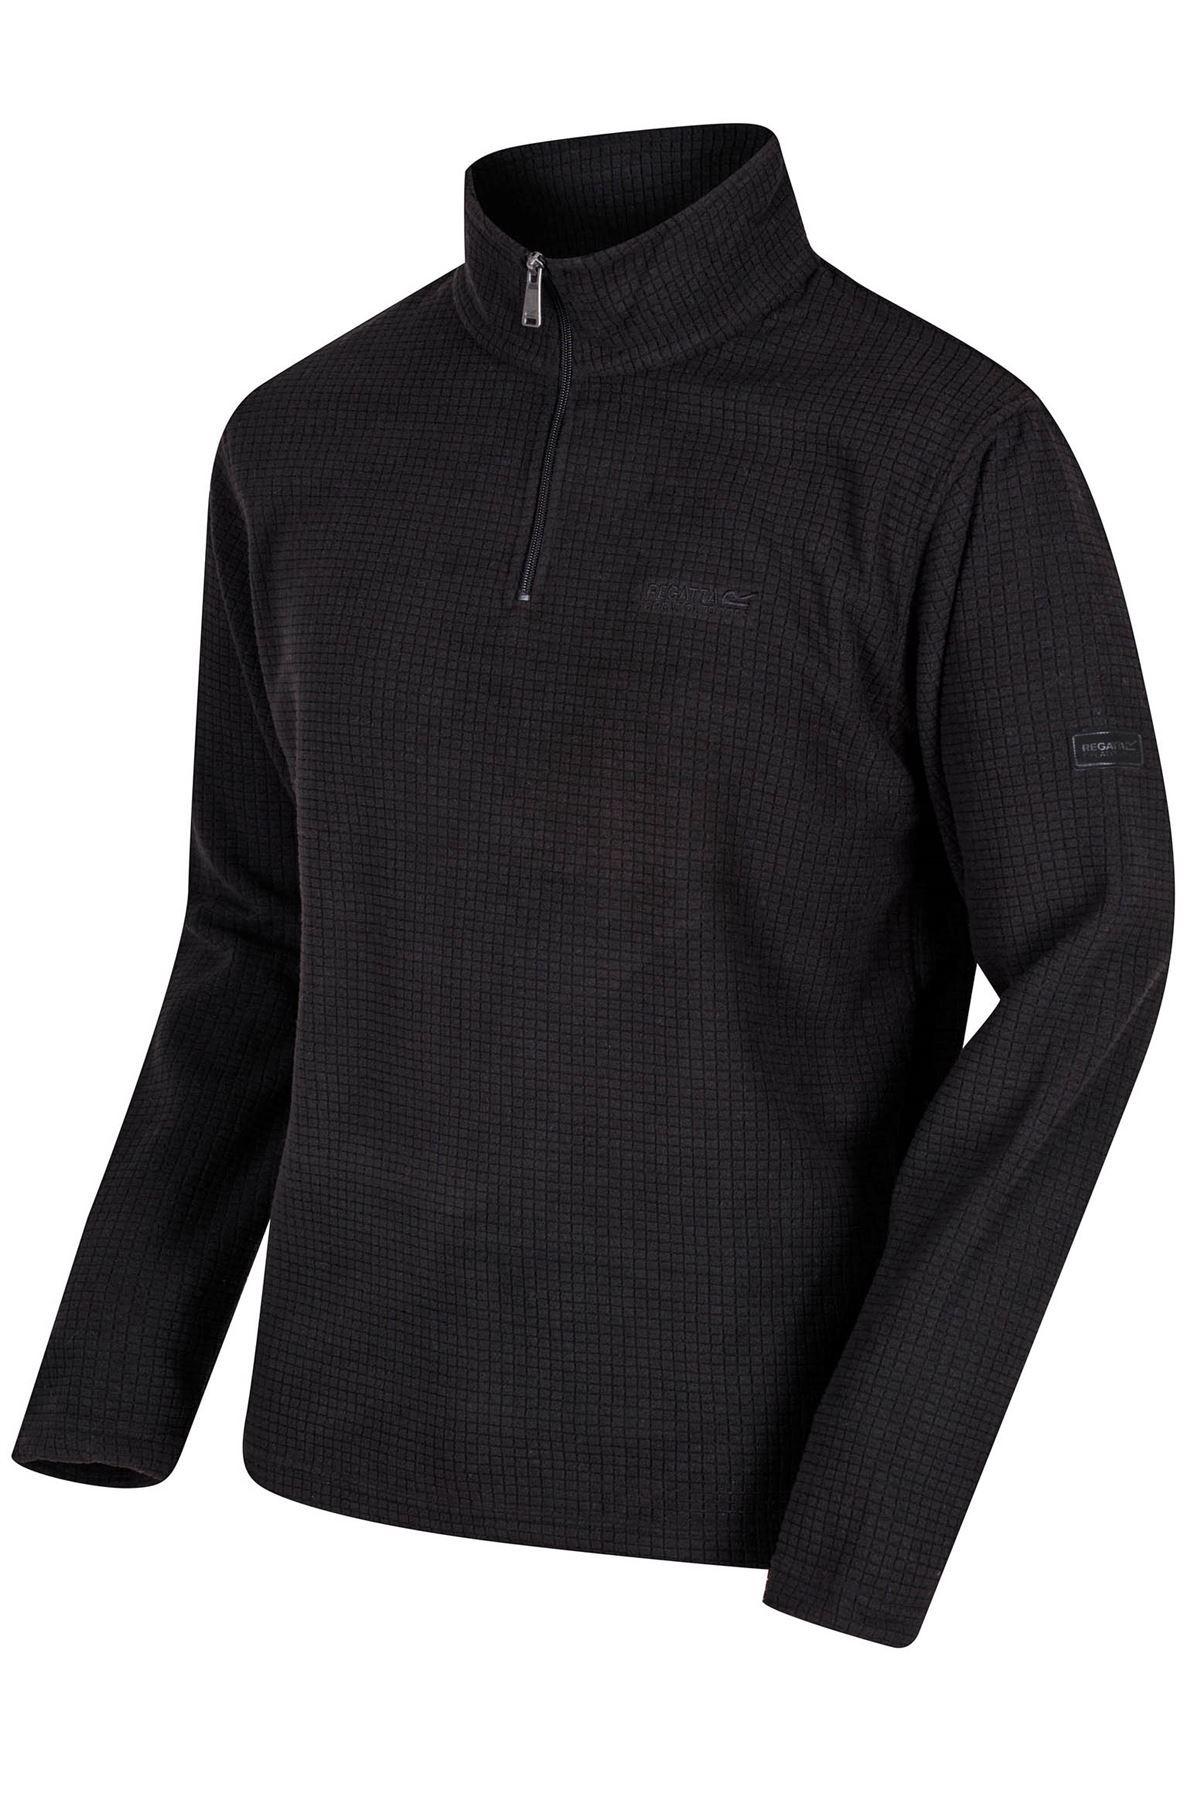 REGATTA-Mens-Half-Zip-Neck-Grid-Textured-Fleece-RRP-30 thumbnail 12